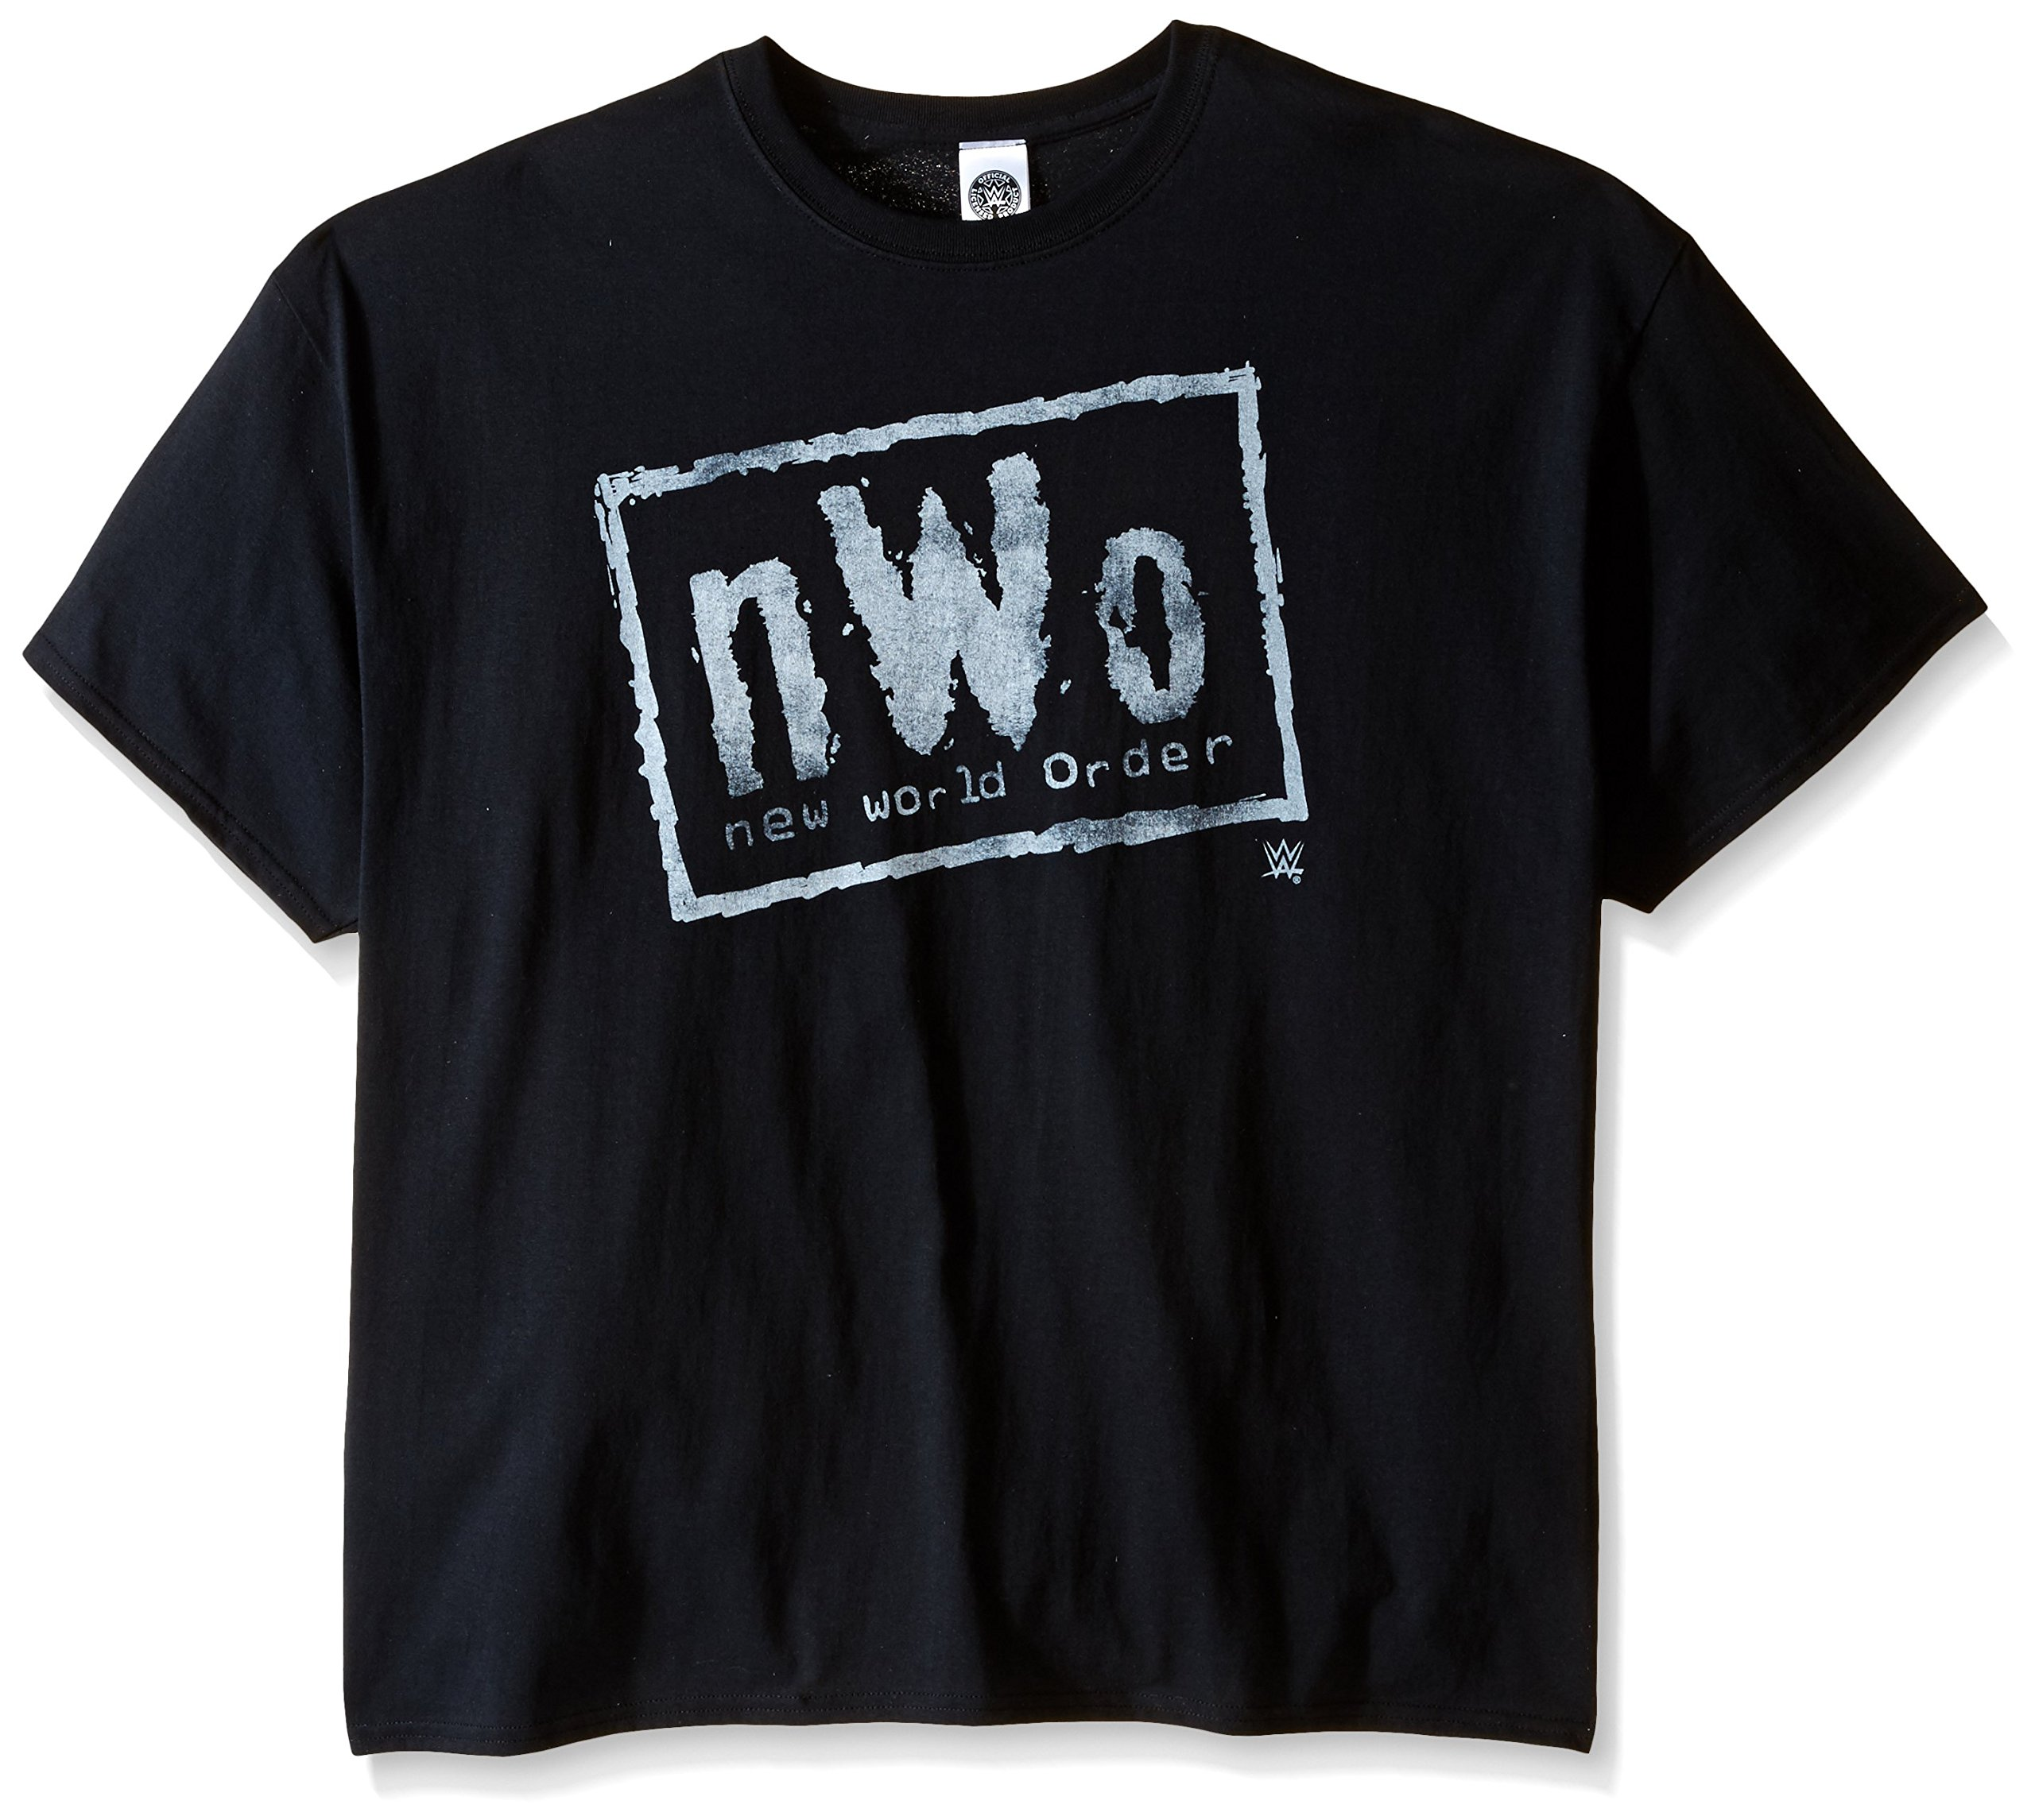 Buy WWE Men's Big Bossman T-Shirt, Light Blue, Features WWE the big boss man Men's short sleeve knit t-shirts Share Facebook Twitter Pinterest. $ & FREE Ghostbusters Men's Big and Tall Classic Logo T-Shirt out of 5 stars $ - $/5(7).